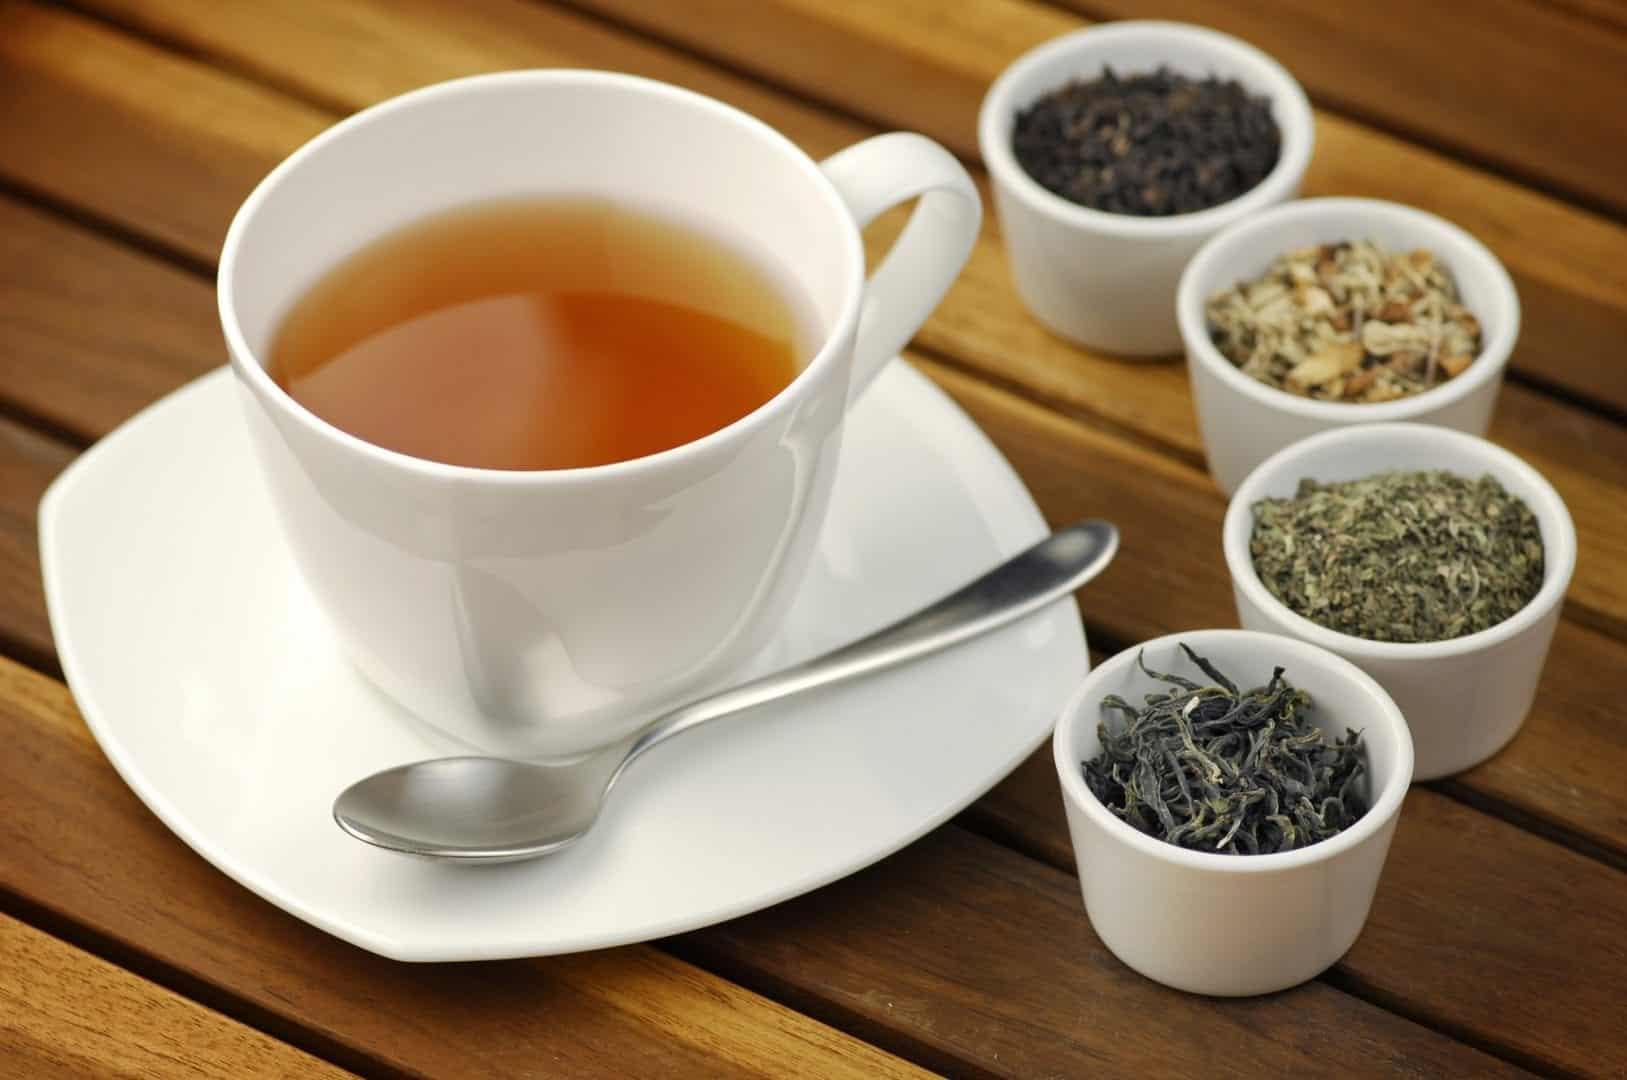 Chás para desinchar- 9 receitas de chás + o por quê de retermos líquidos